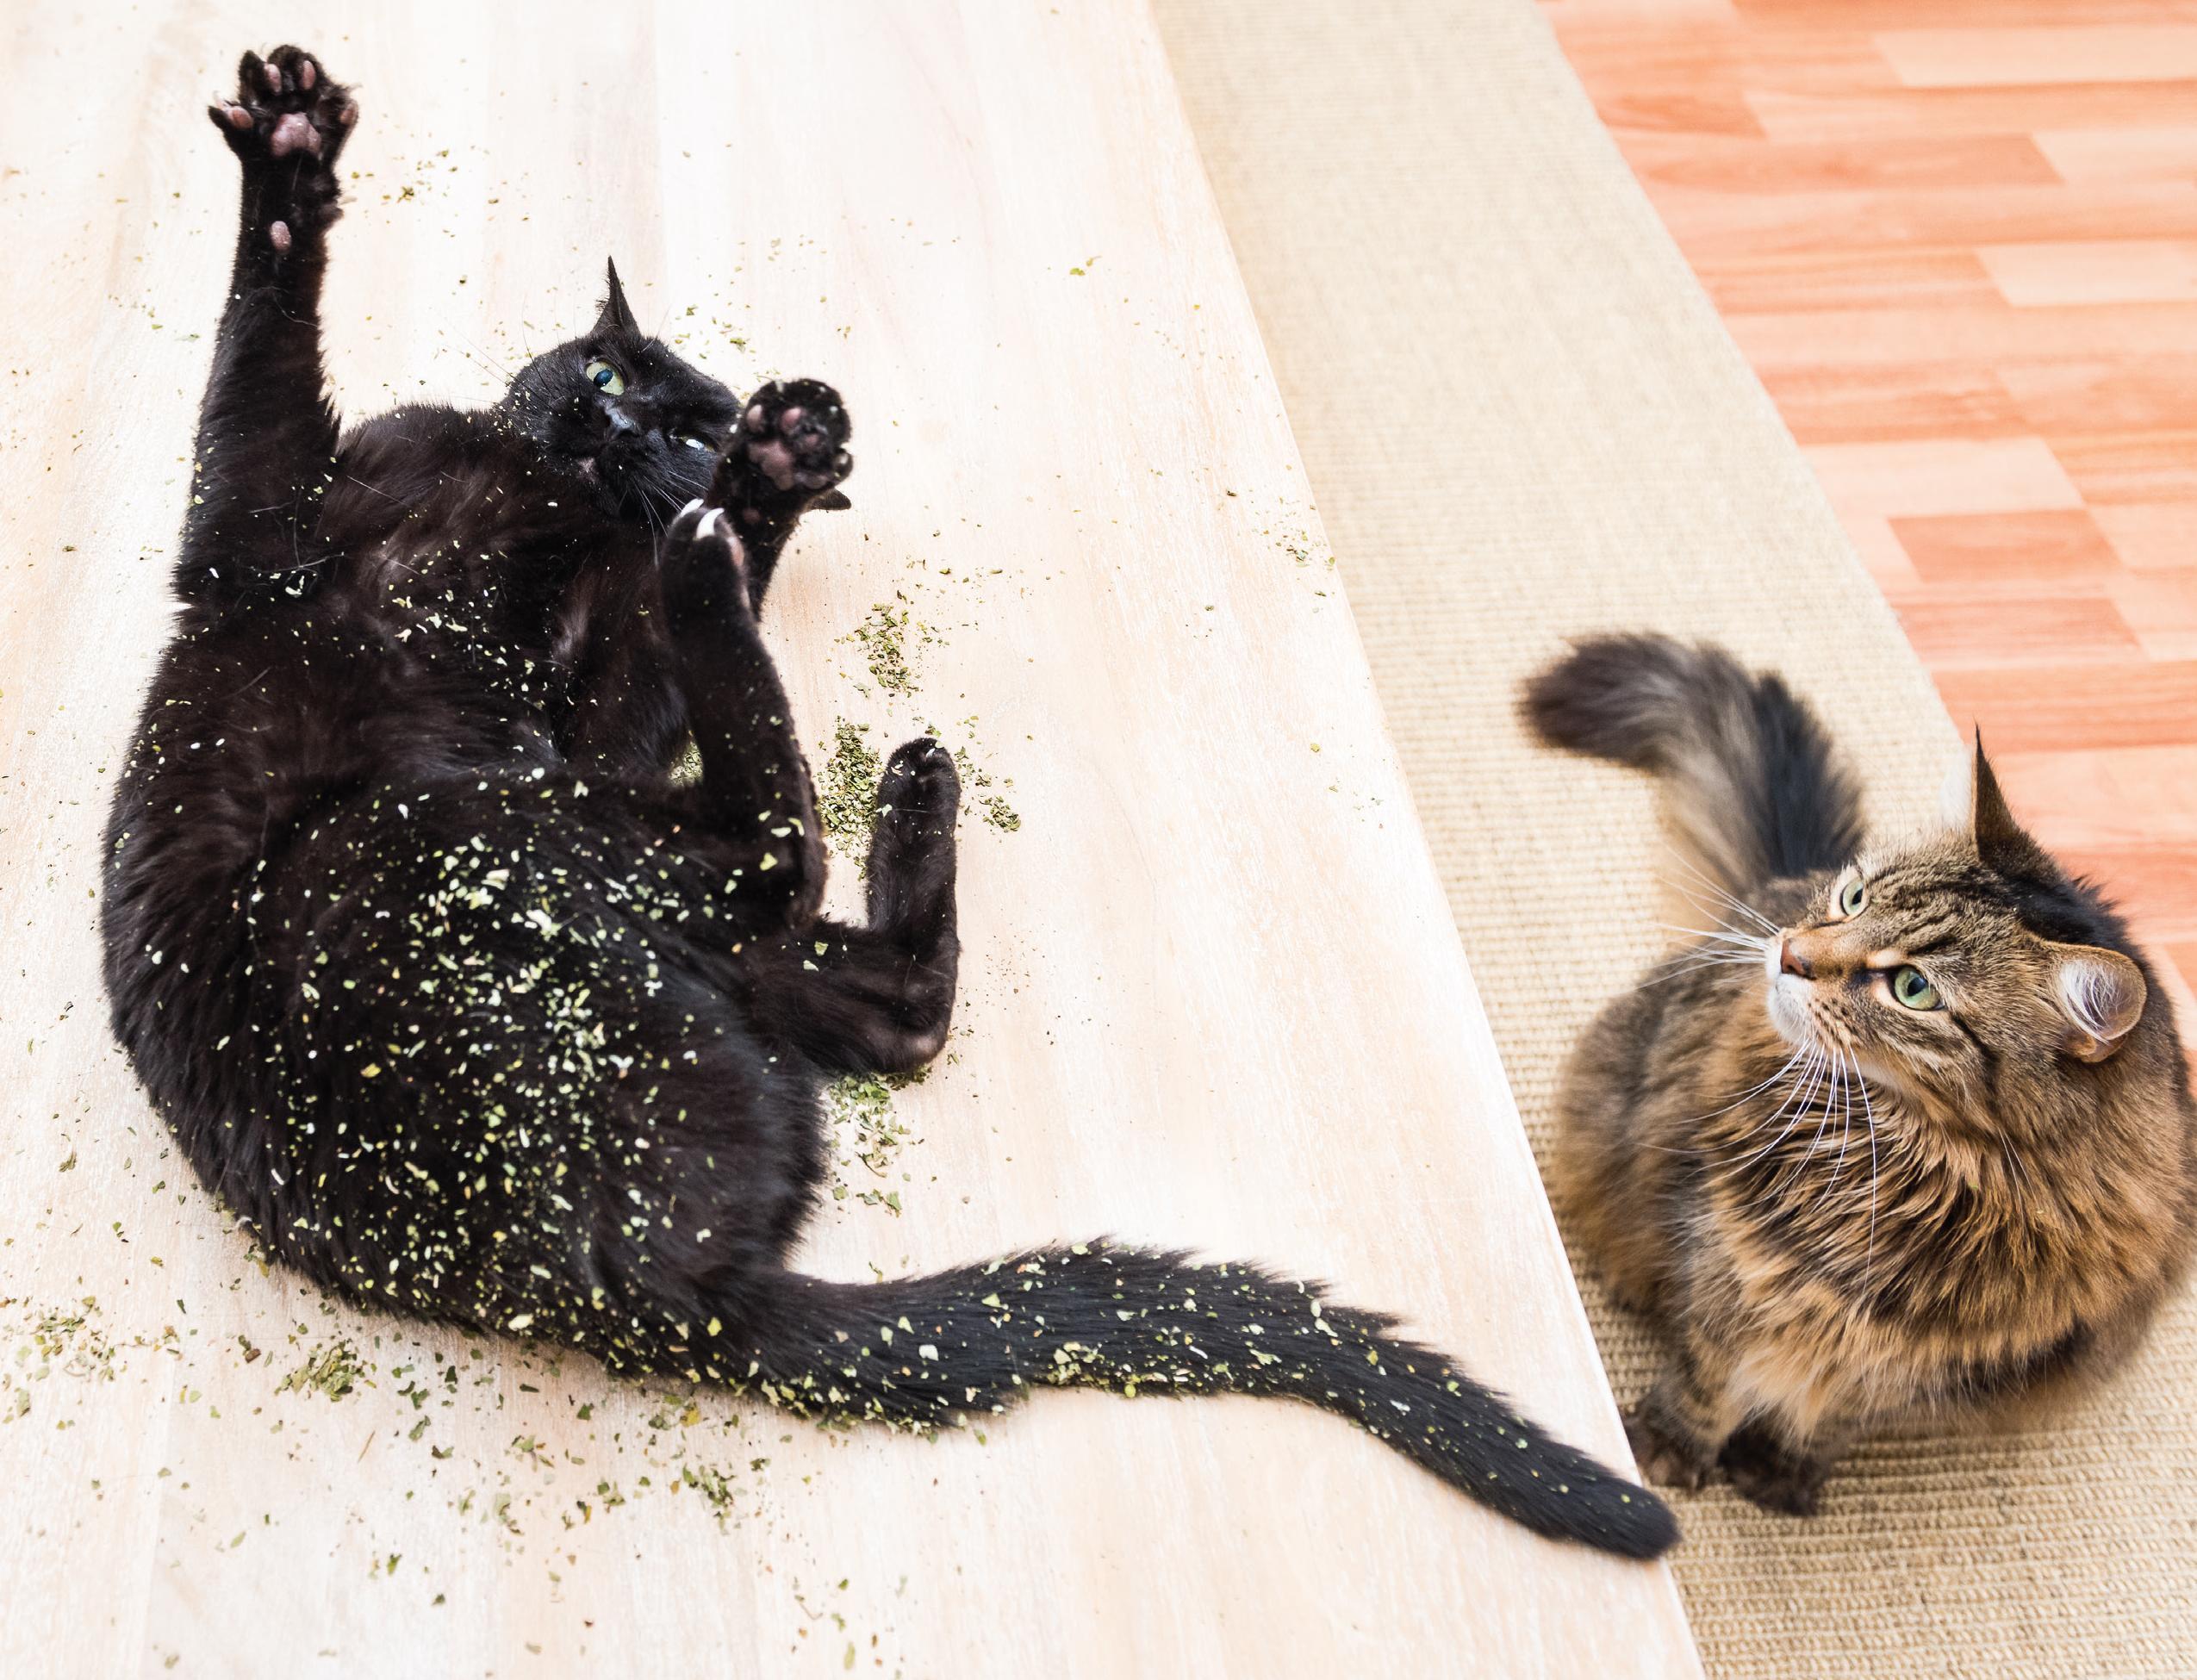 Cat can Allergic To Catnip